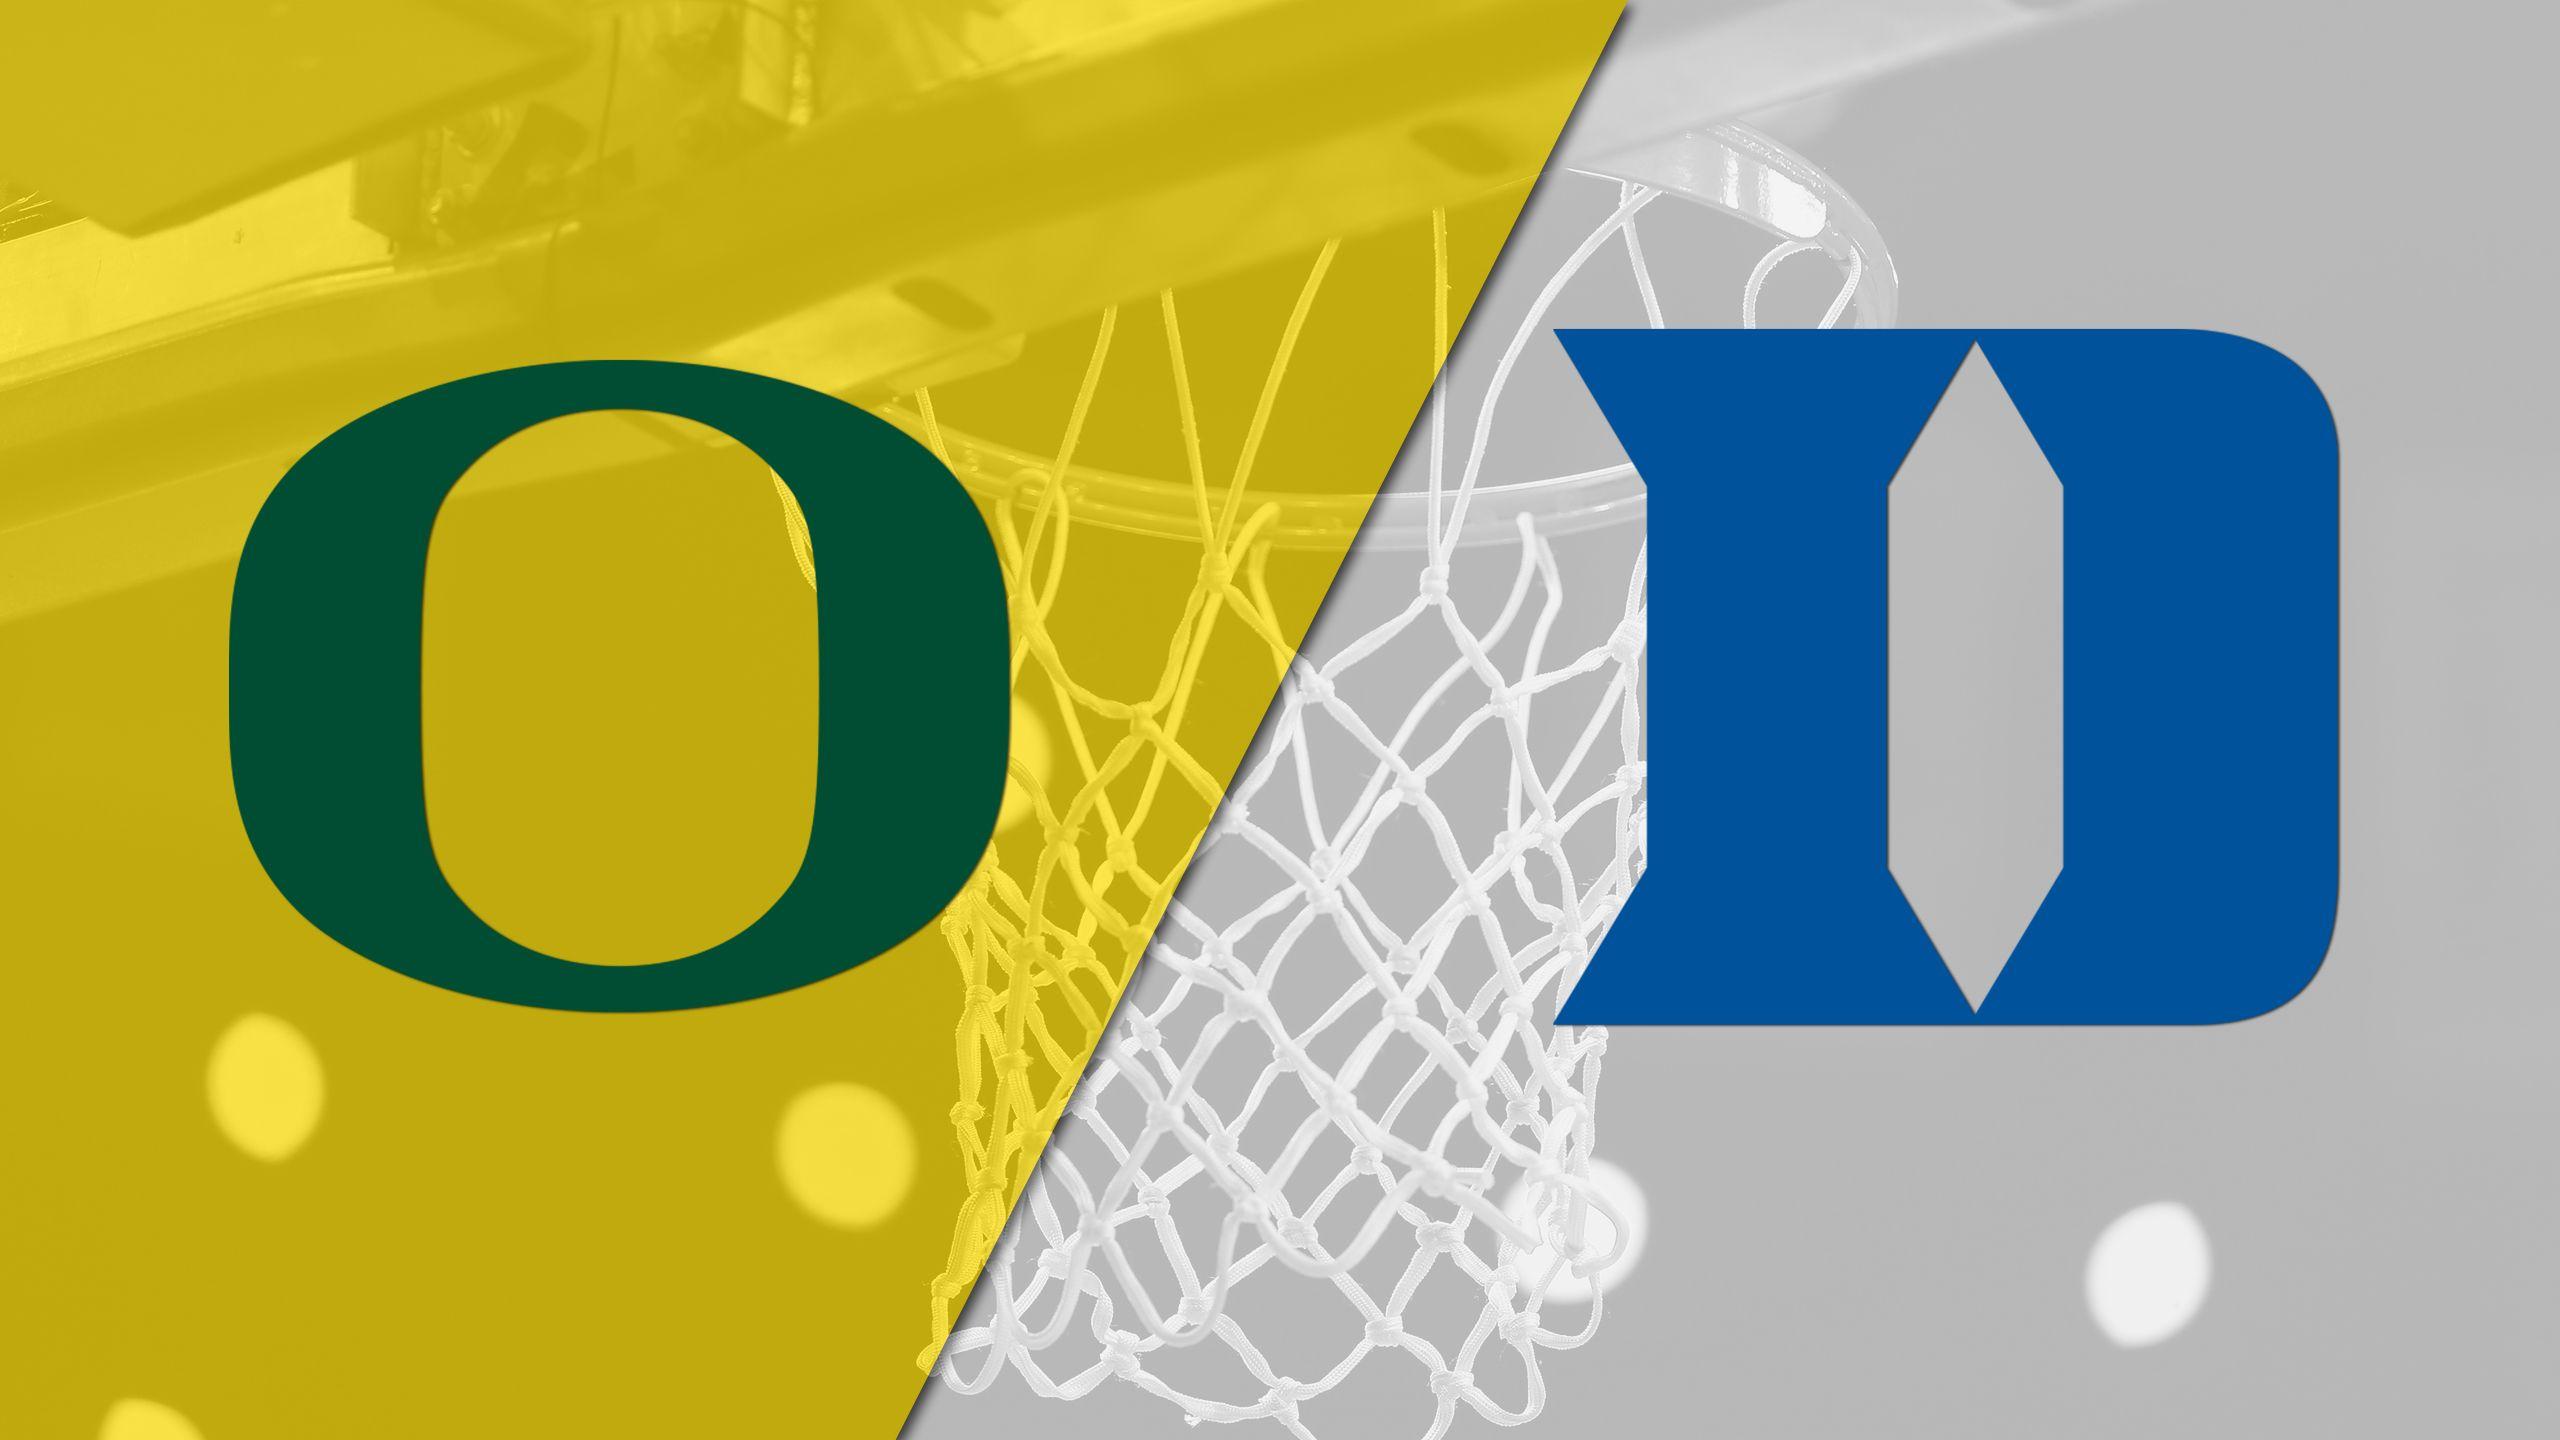 #10 Oregon vs. #2 Duke (Second Round) (NCAA Women's Basketball Championship)